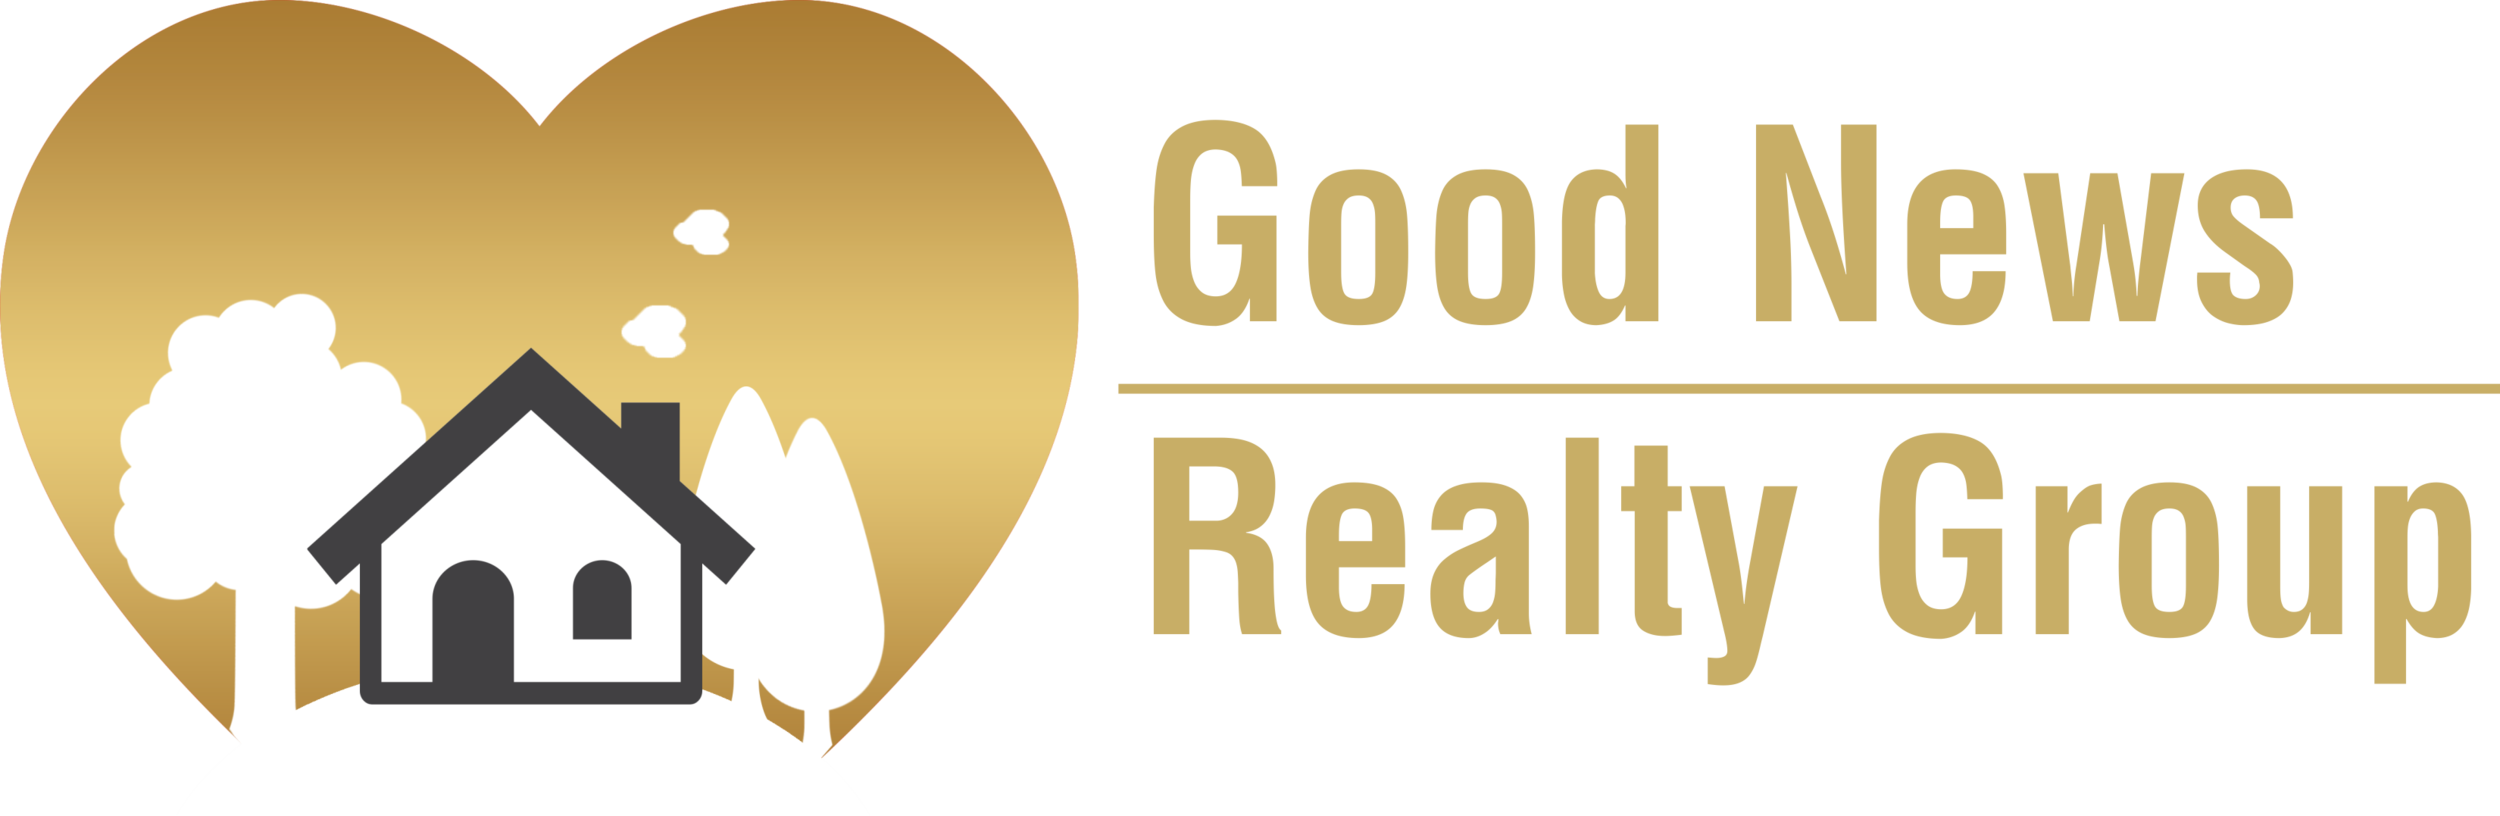 good news group logo horizontal.png